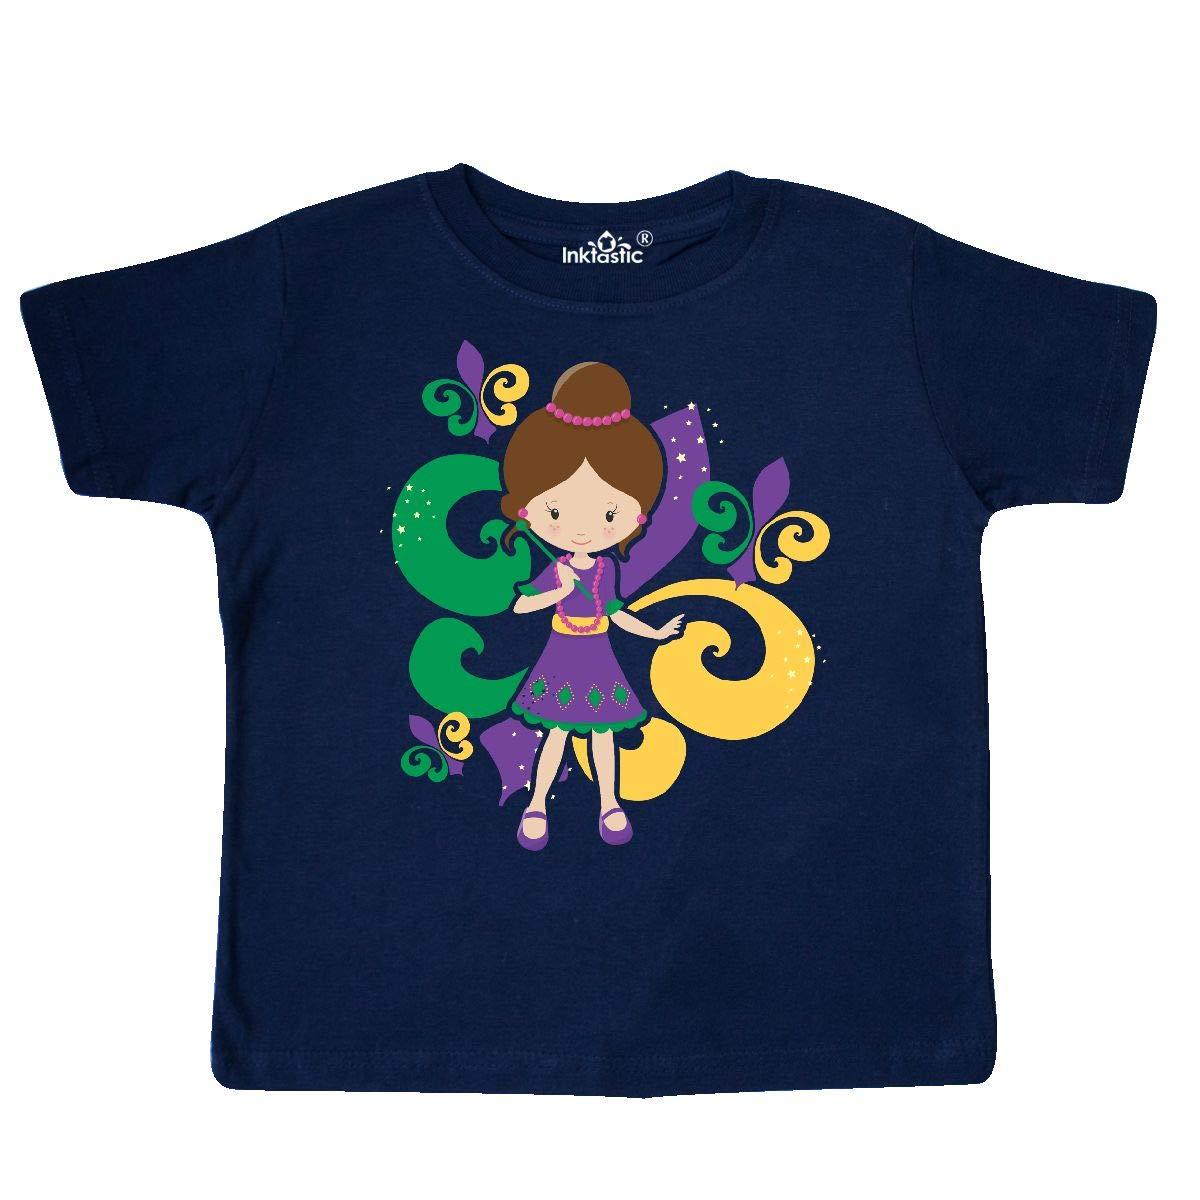 inktastic Mardi Gras Girl Toddler T-Shirt